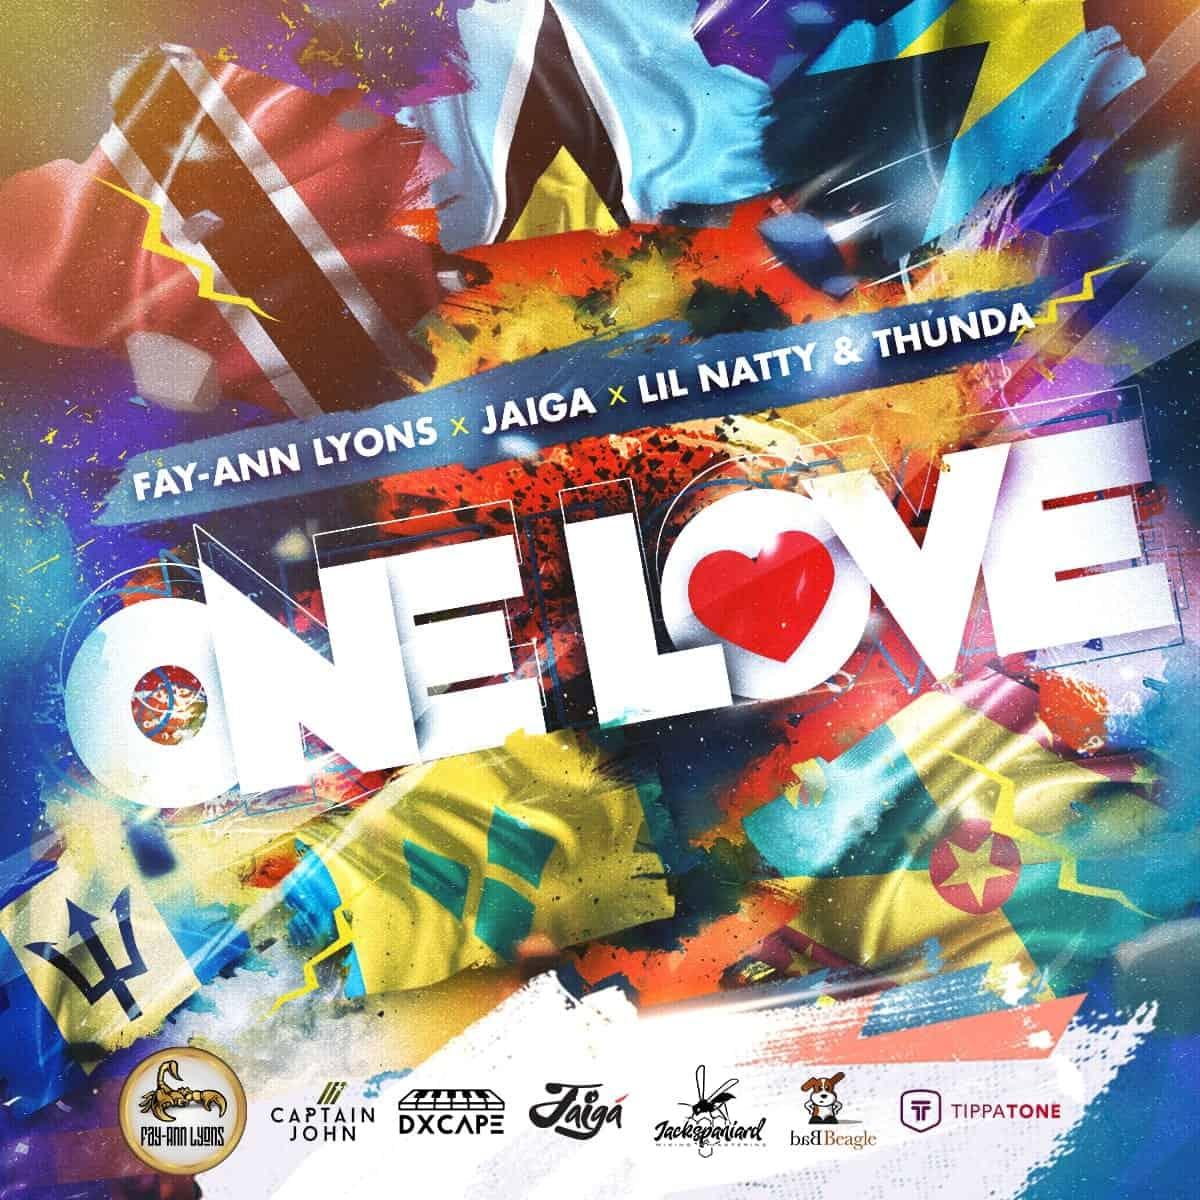 One Love - Fay-Ann Lyons x Lil Natty and Thunda x Jaiga - mp3